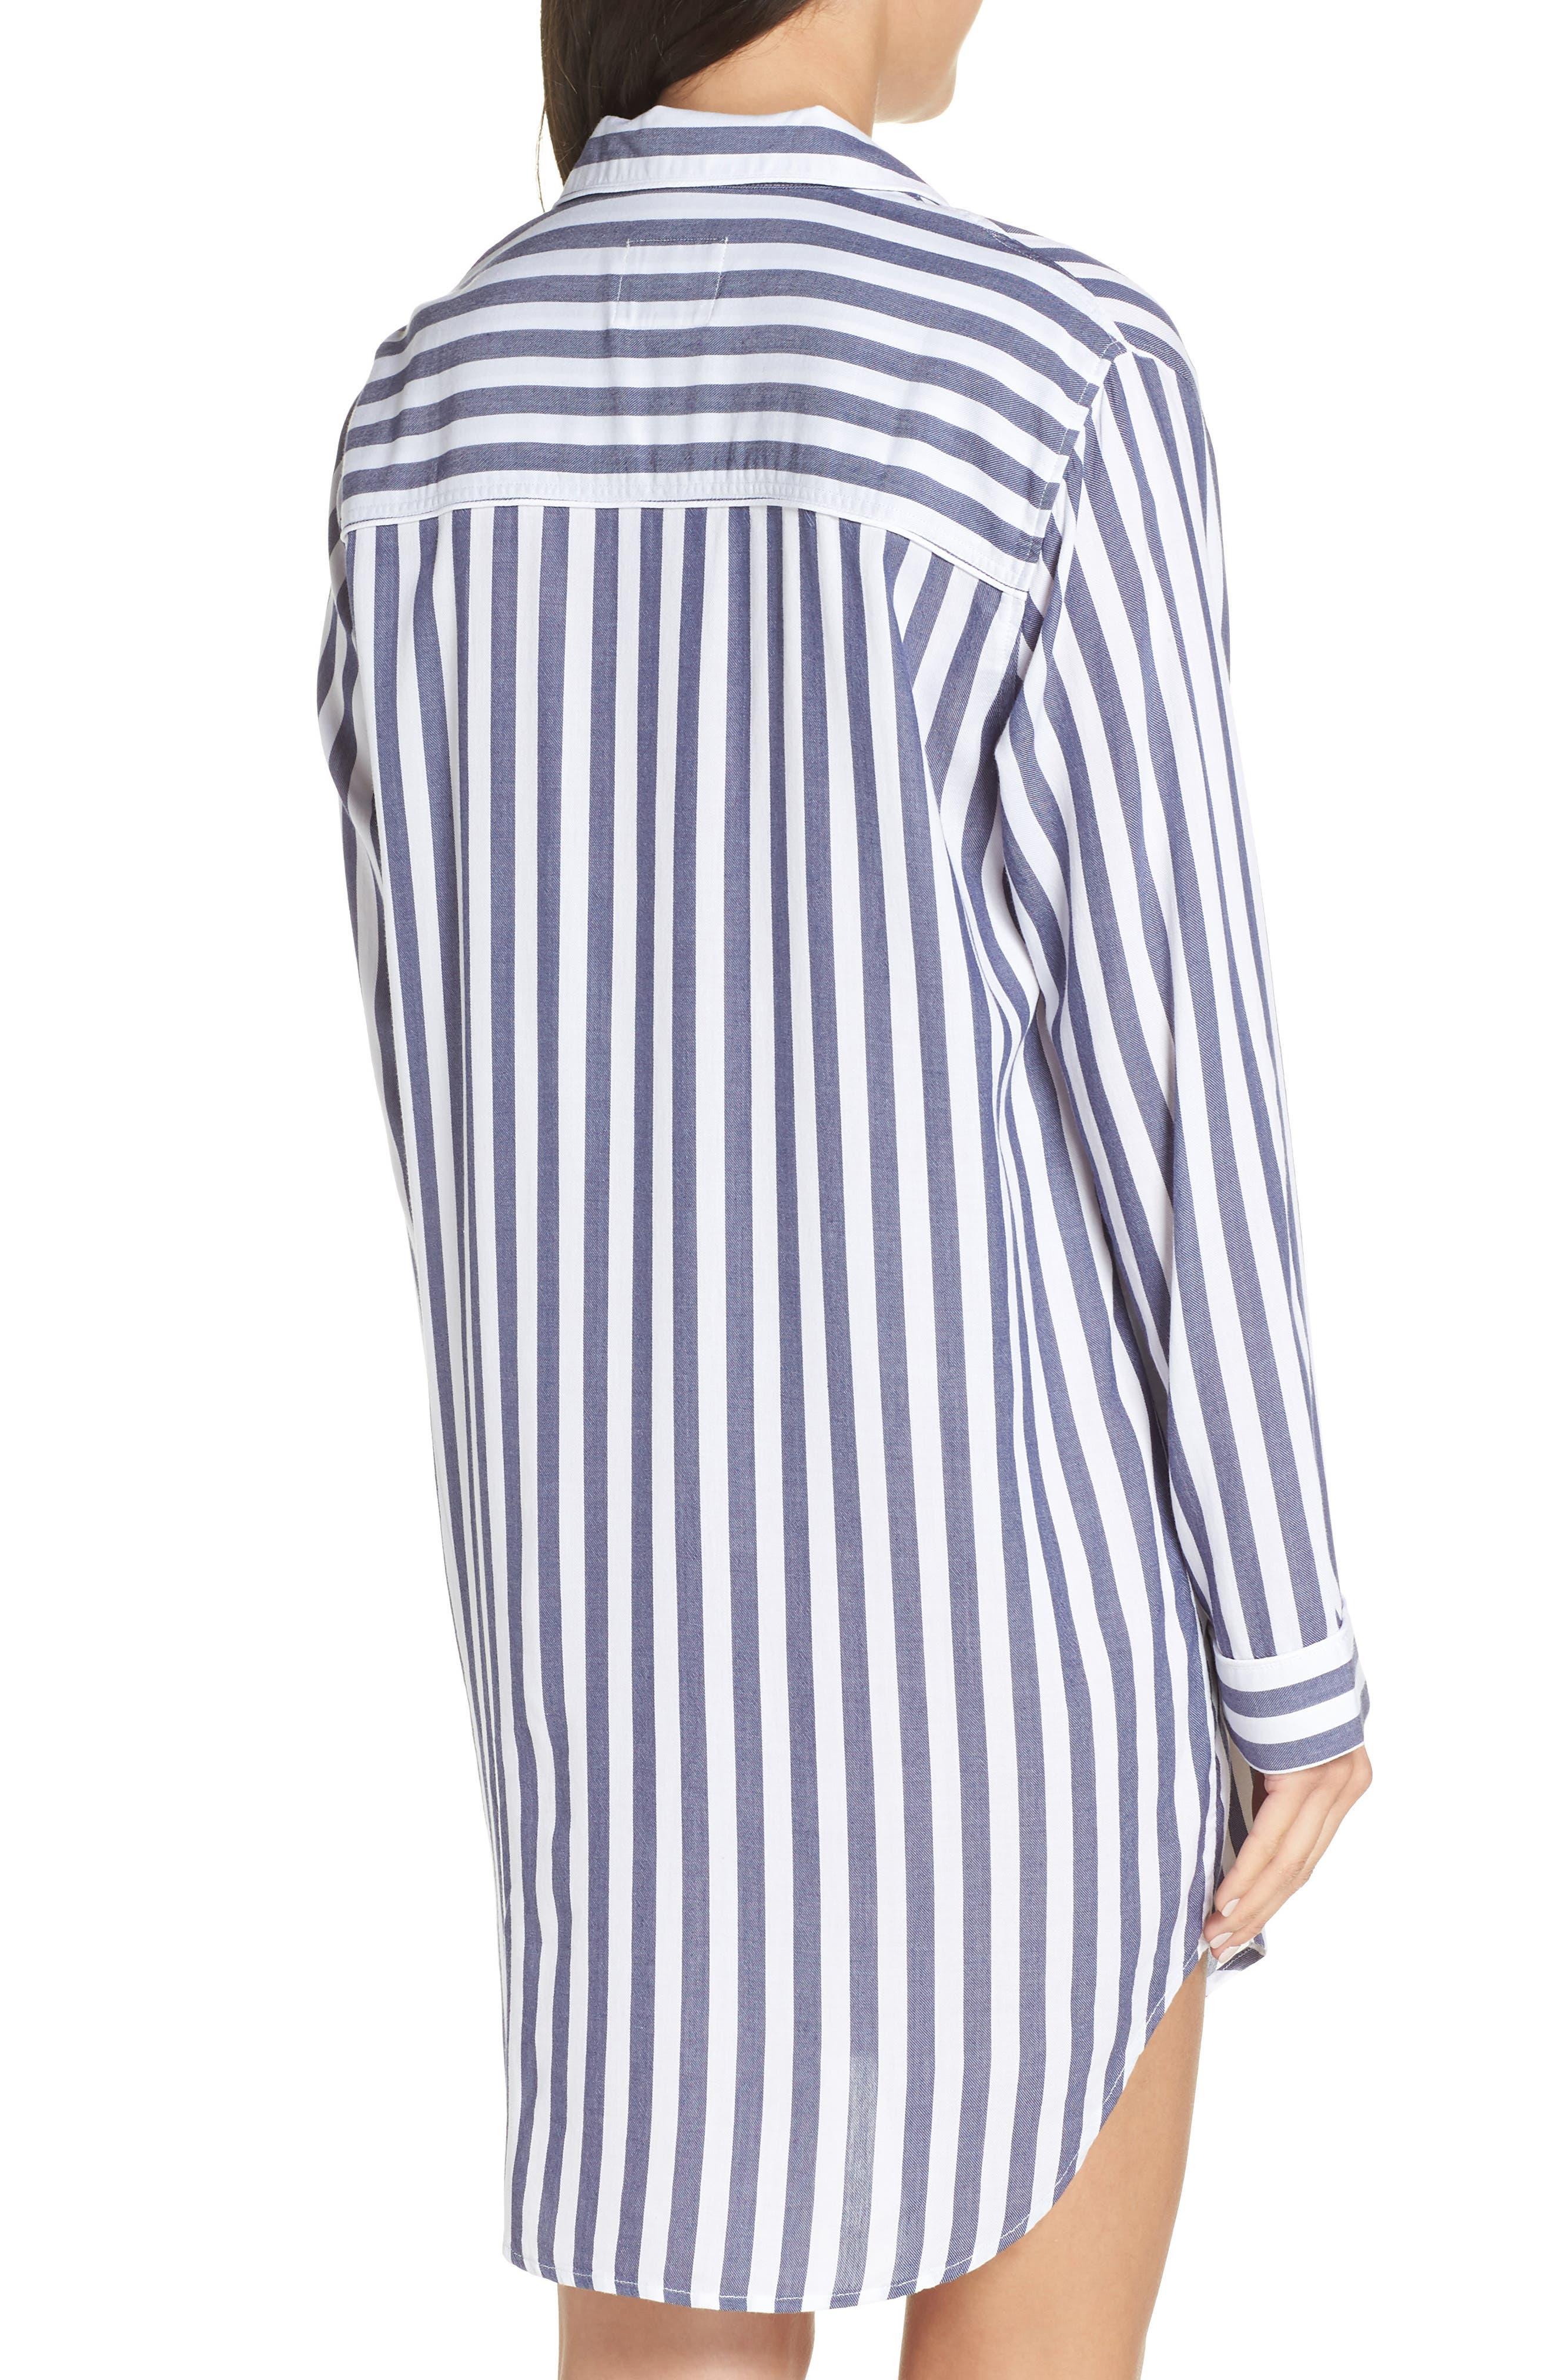 RAILS,                             Striped Sleep Shirt,                             Alternate thumbnail 2, color,                             434